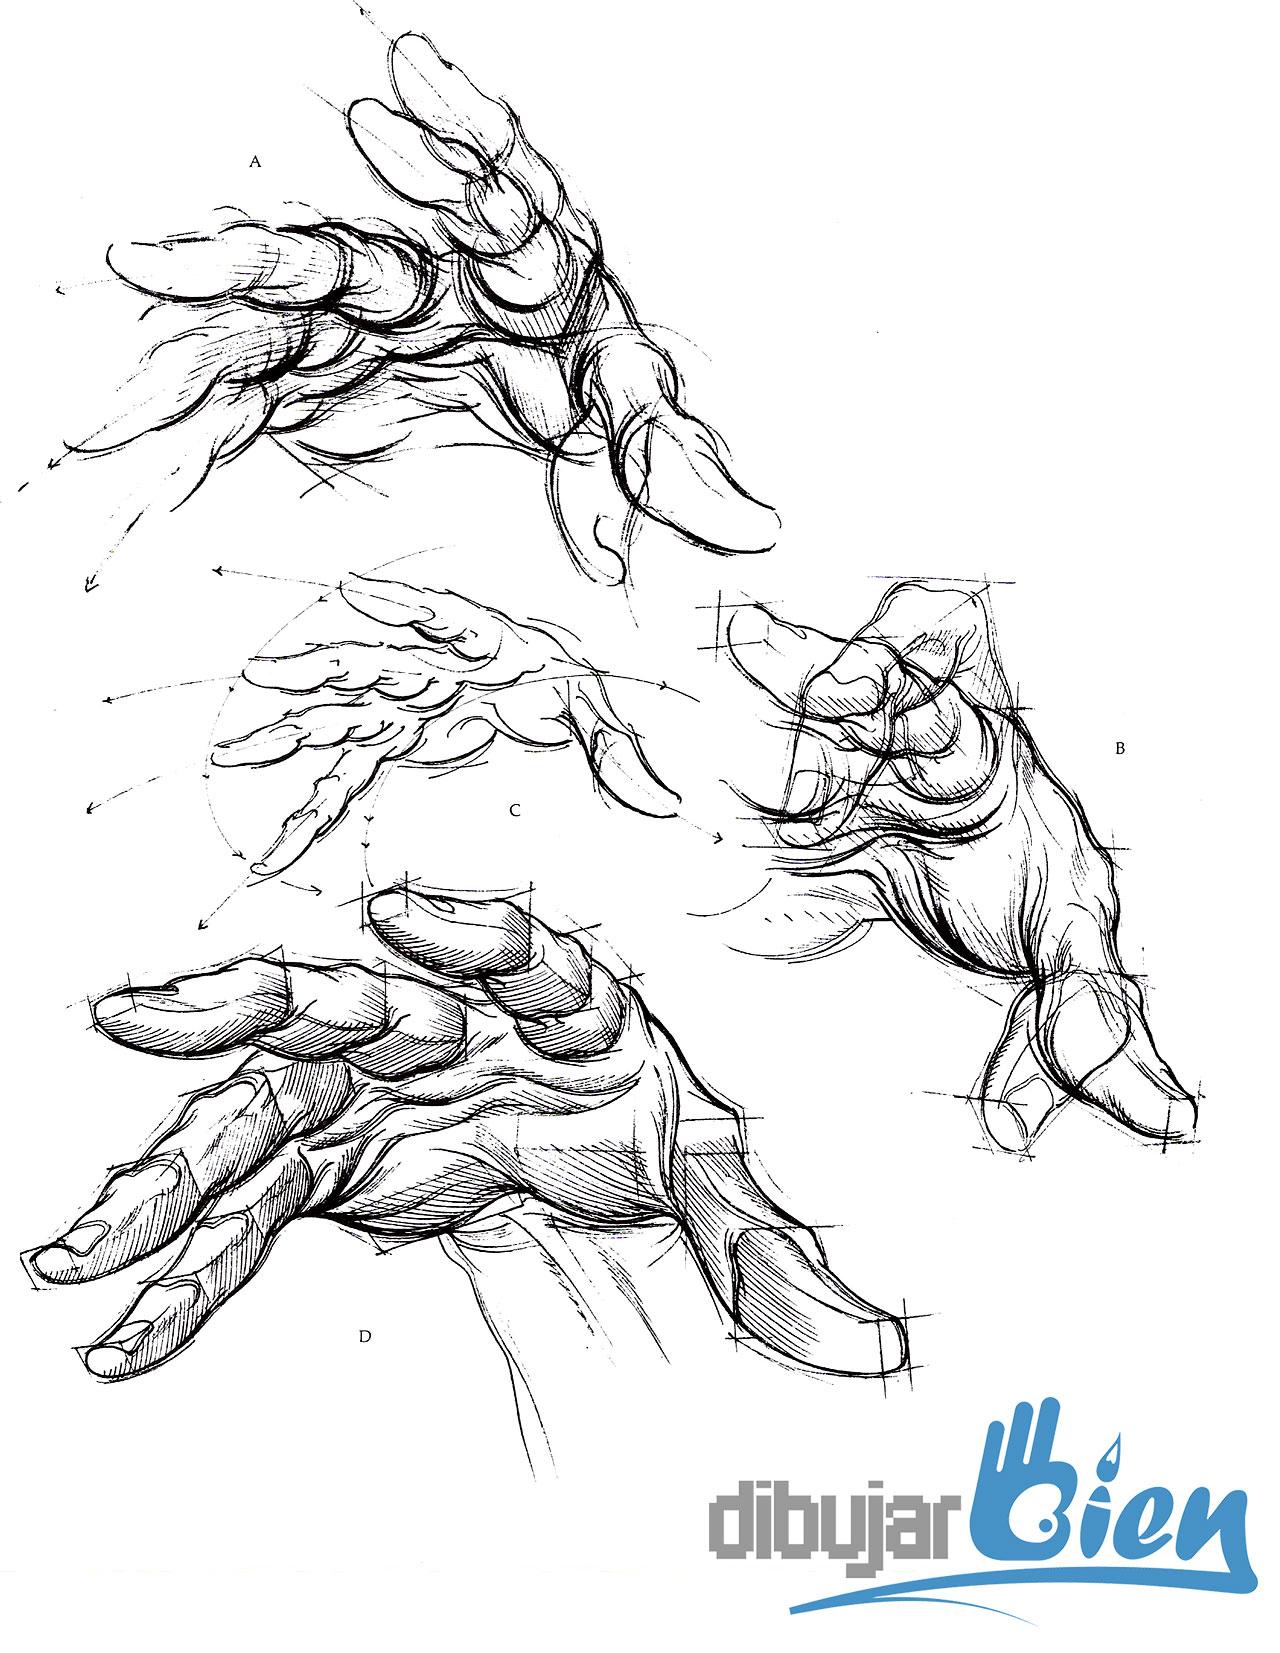 libros-para-dibujar-anatomia-burne-hogarth-manos - Dibujar Bien